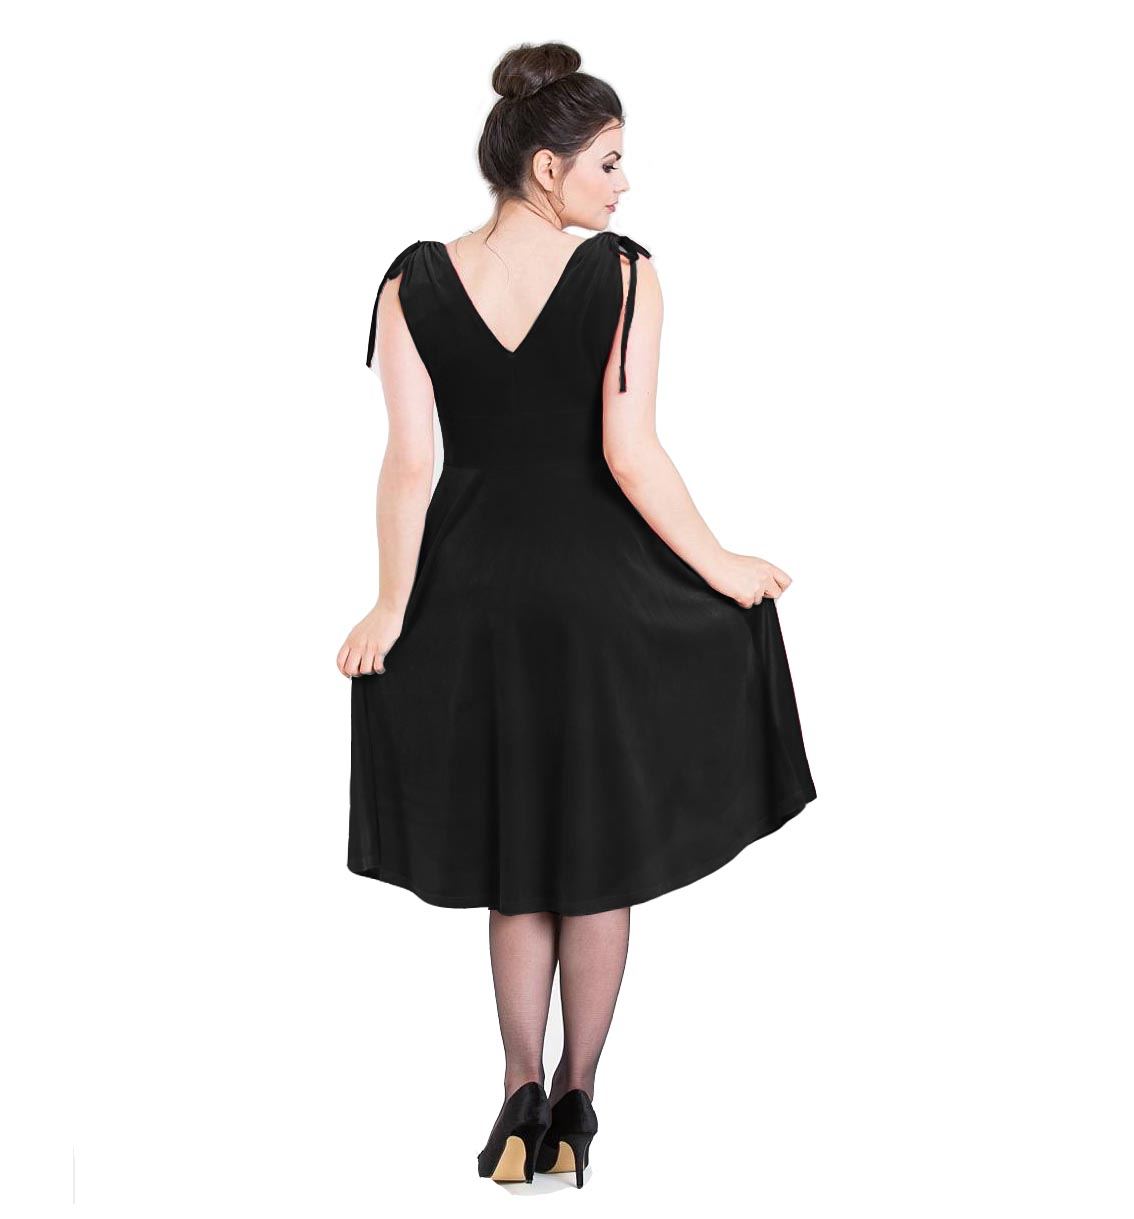 Hell-Bunny-40s-50s-Elegant-Pin-Up-Dress-MELINA-Crushed-Velvet-Black-All-Sizes thumbnail 21